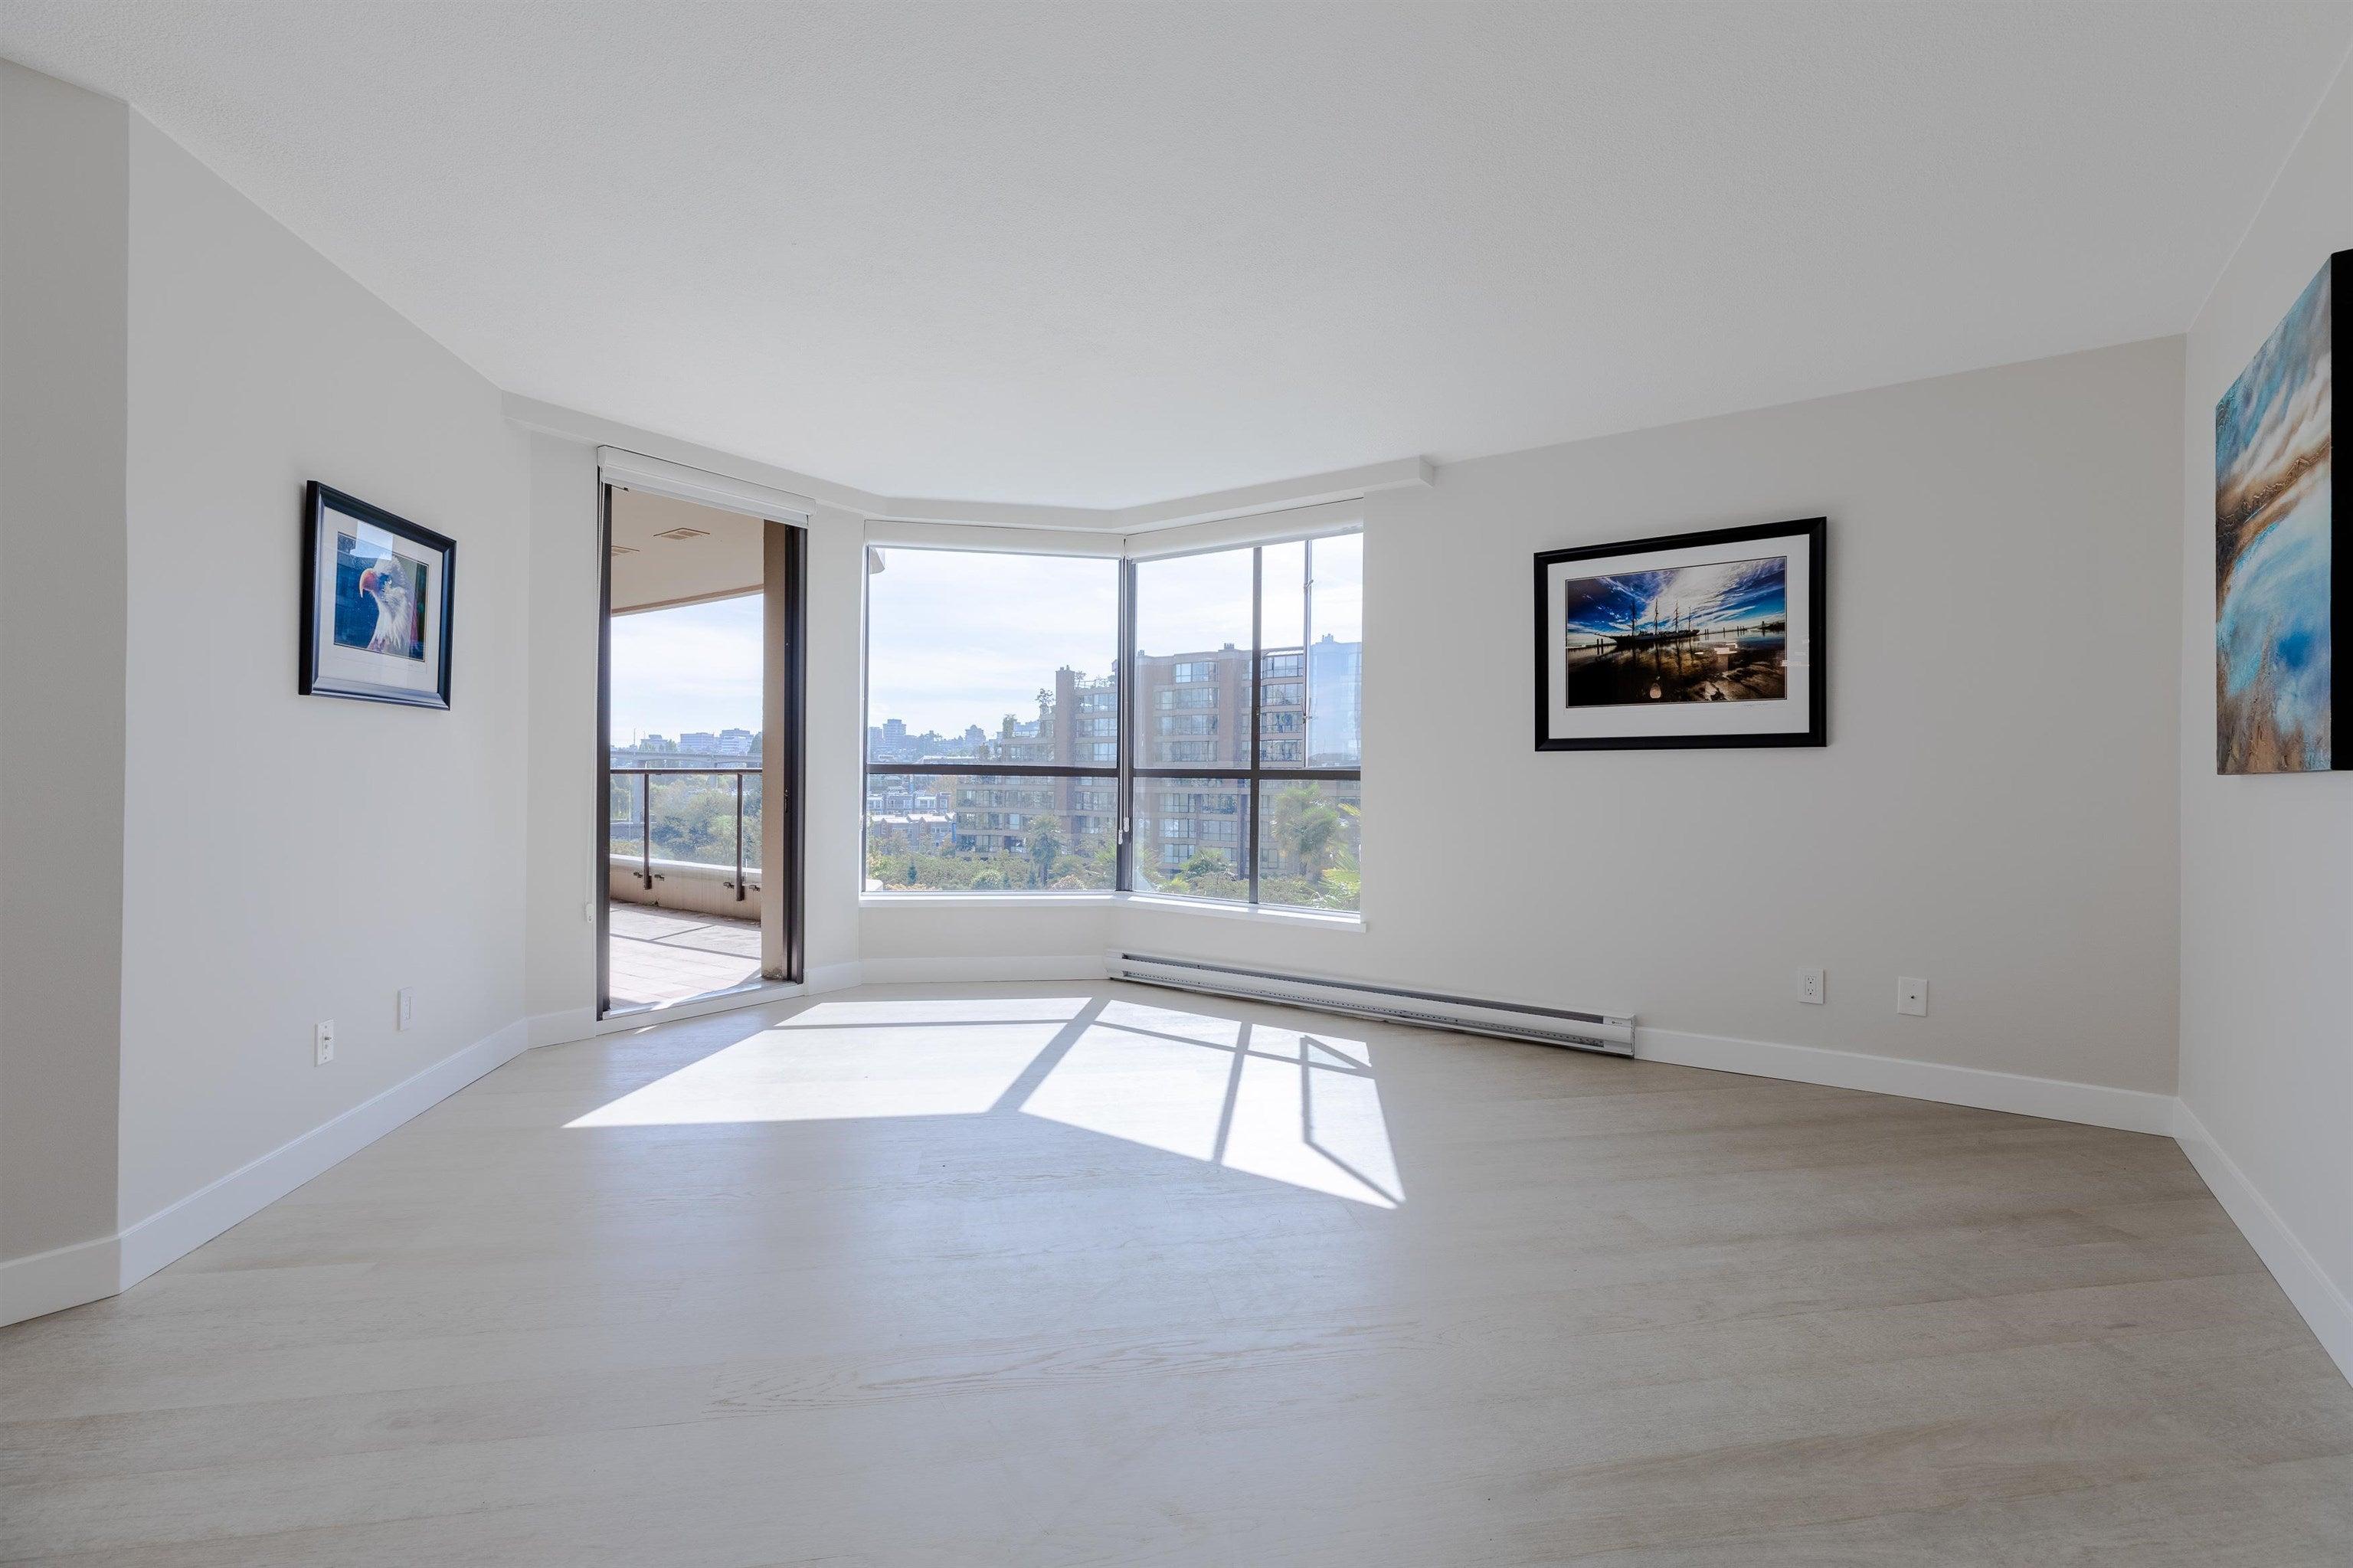 406 1450 PENNYFARTHING DRIVE - False Creek Apartment/Condo for sale, 2 Bedrooms (R2617259) - #15